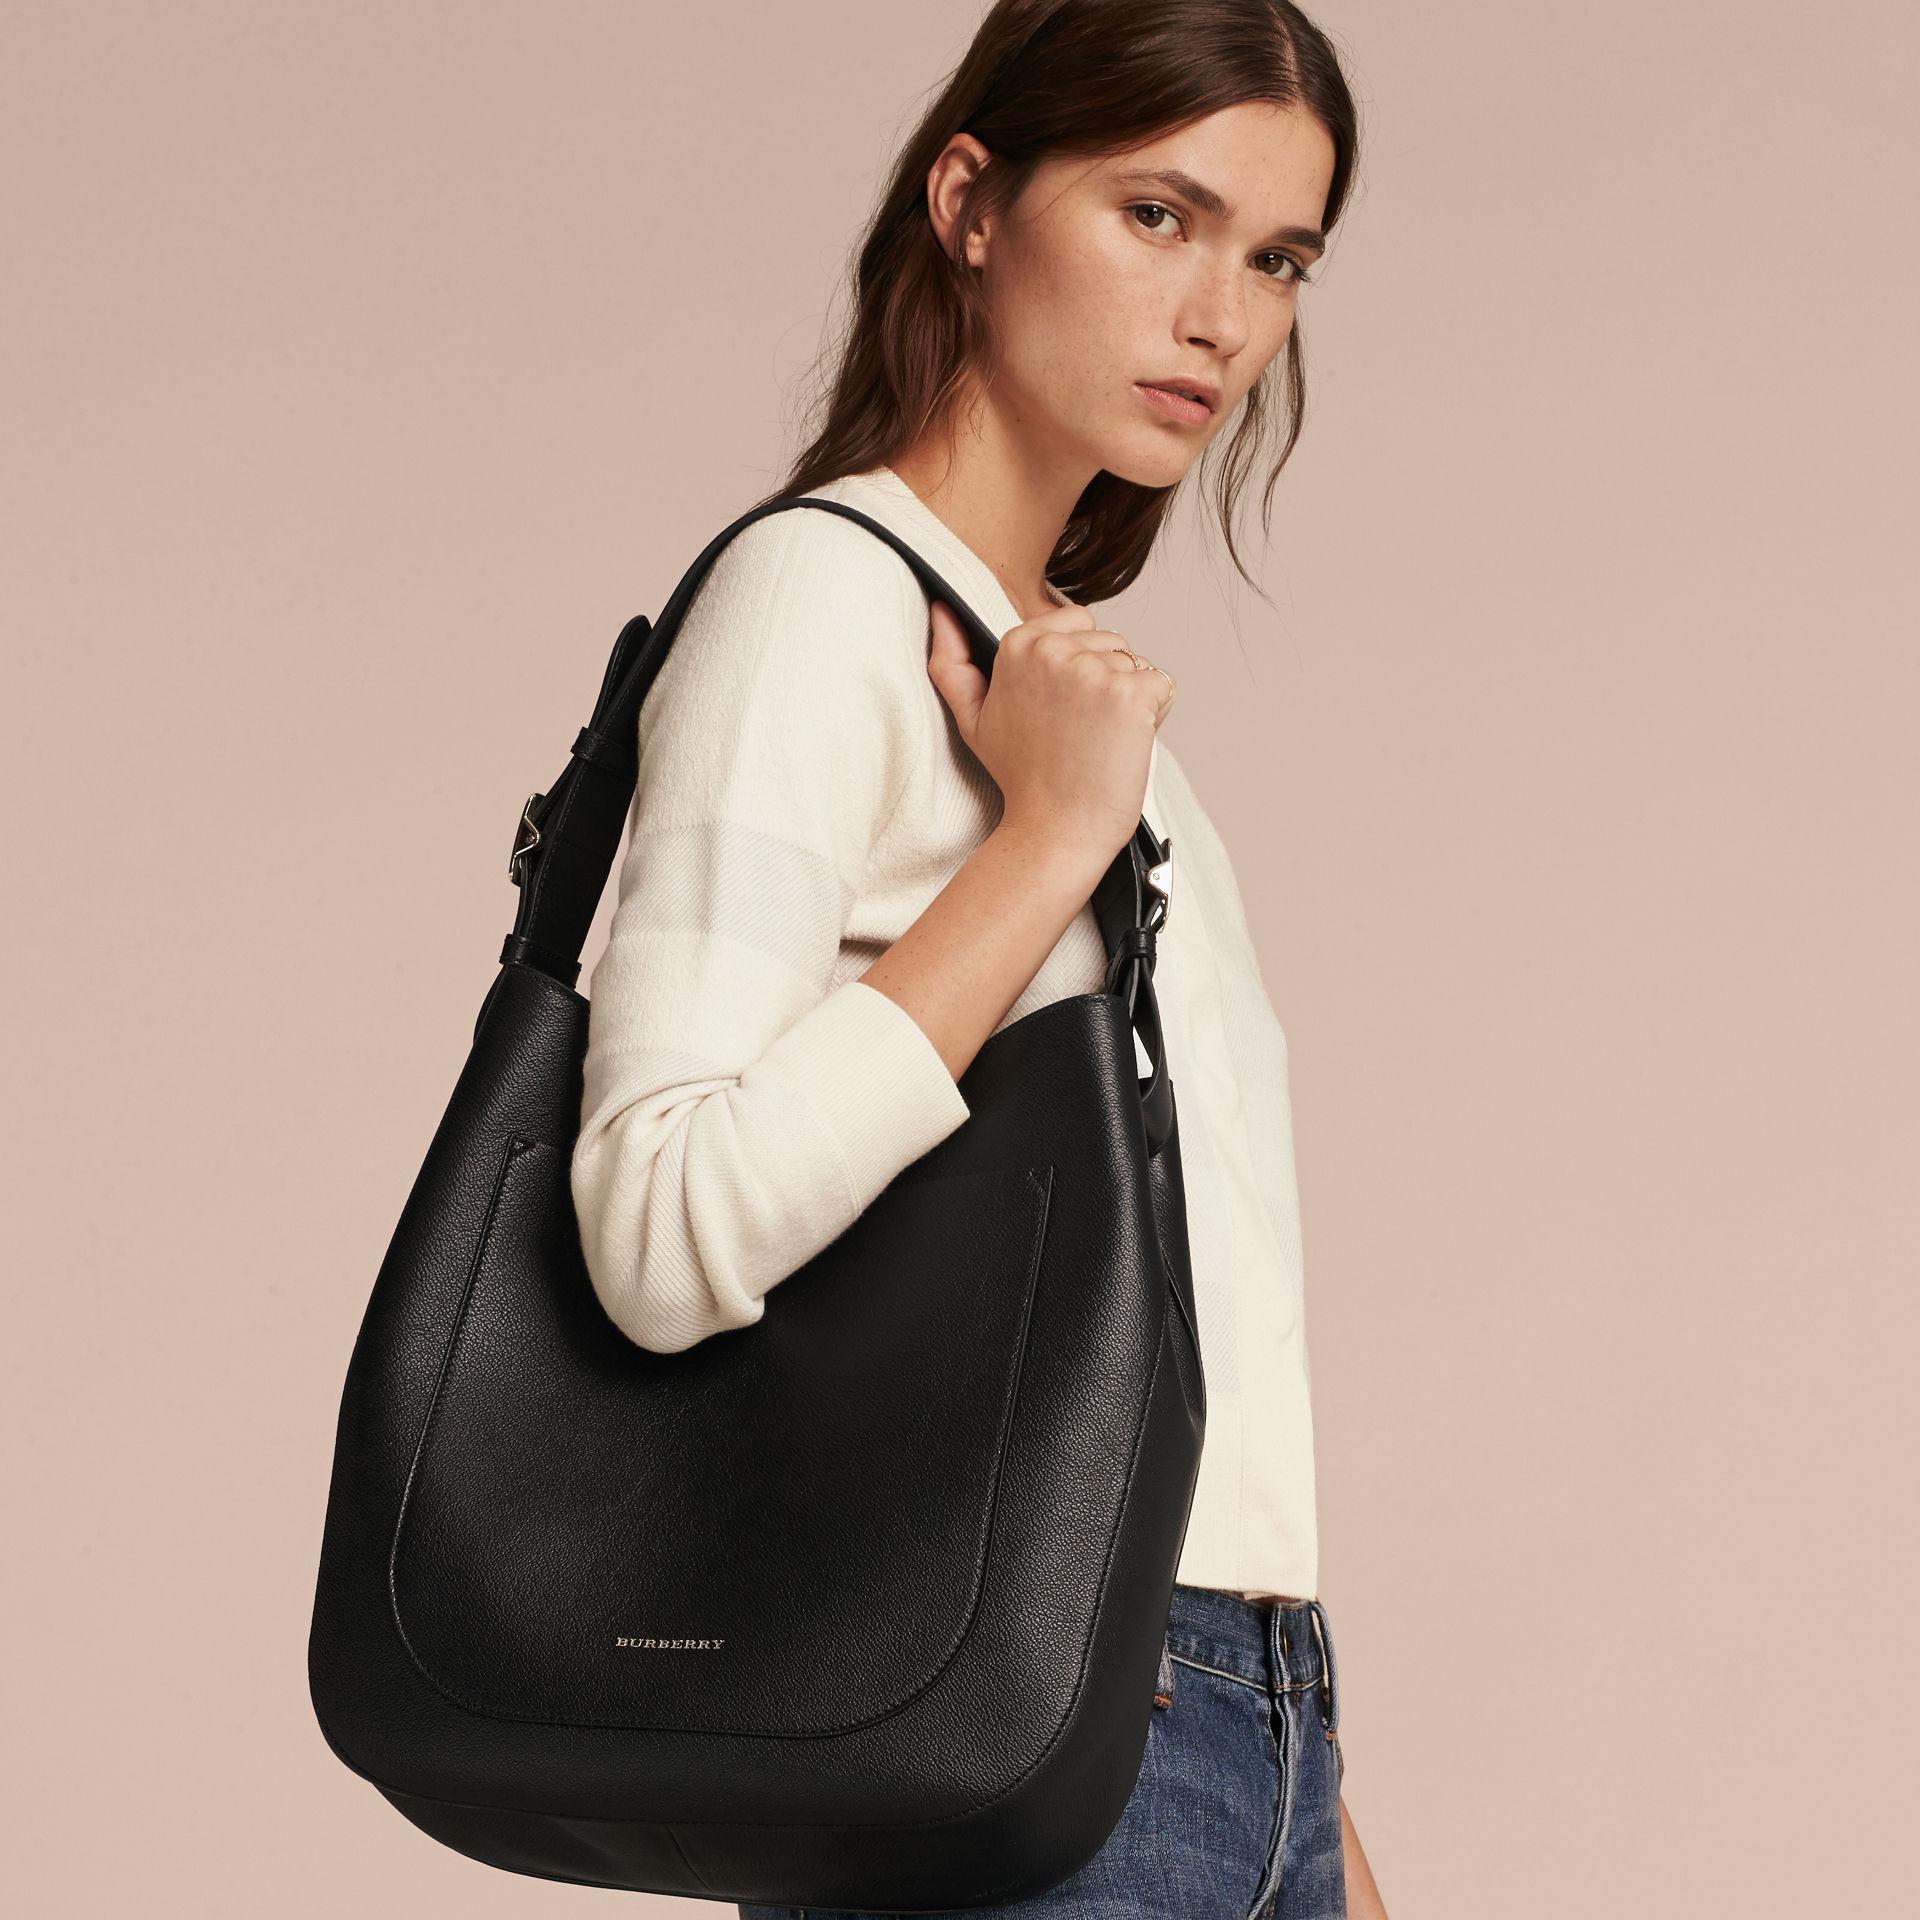 Burberry Textured Leather Shoulder Bag Black in Black - Lyst 960a696b86